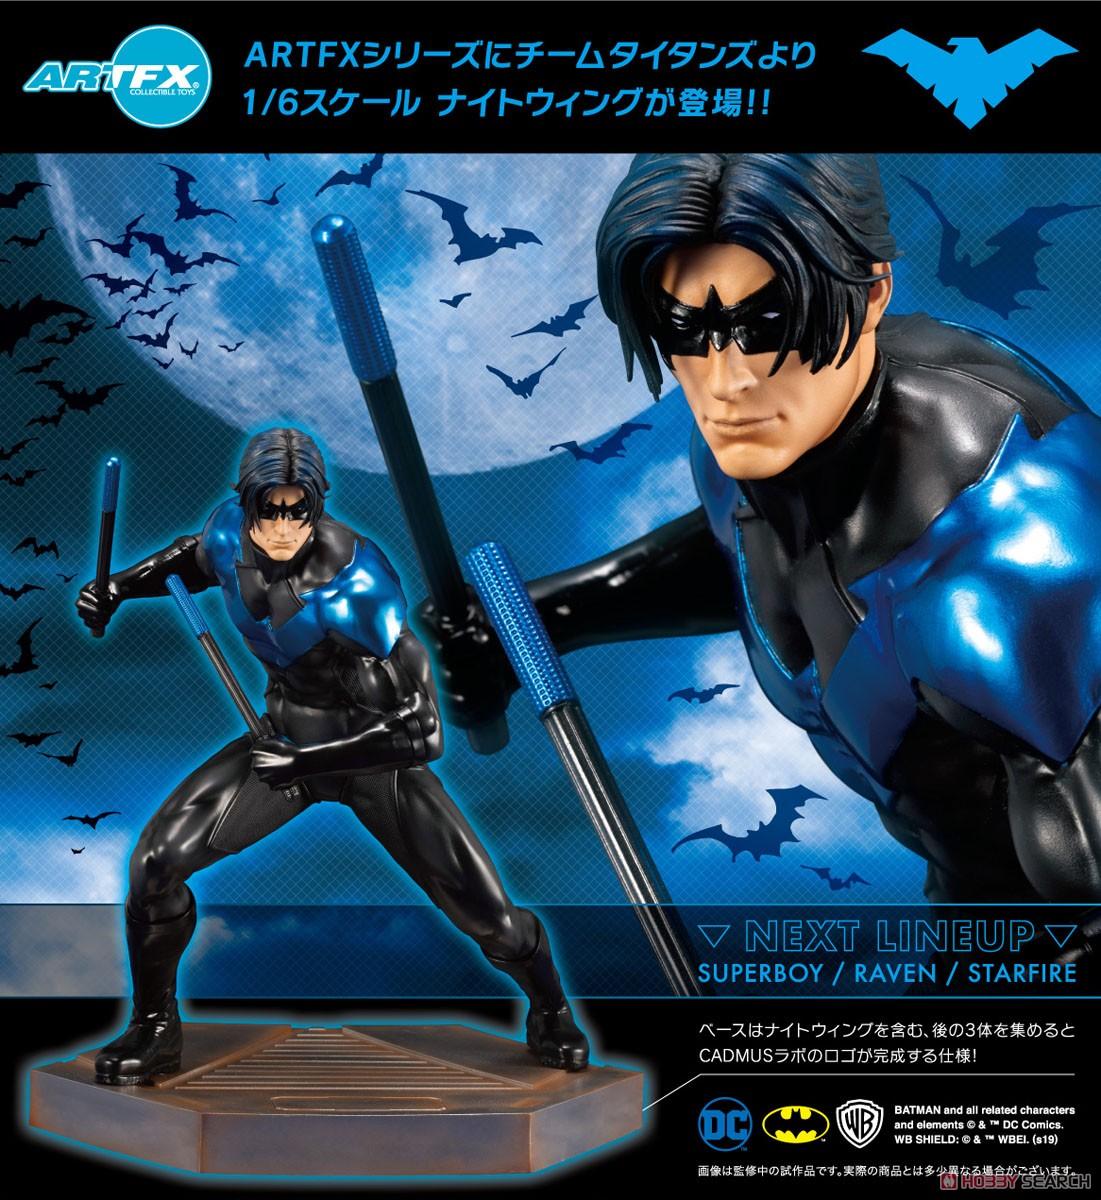 ARTFX『ナイトウィング』DCコミックス 1/6 完成品フィギュア-014